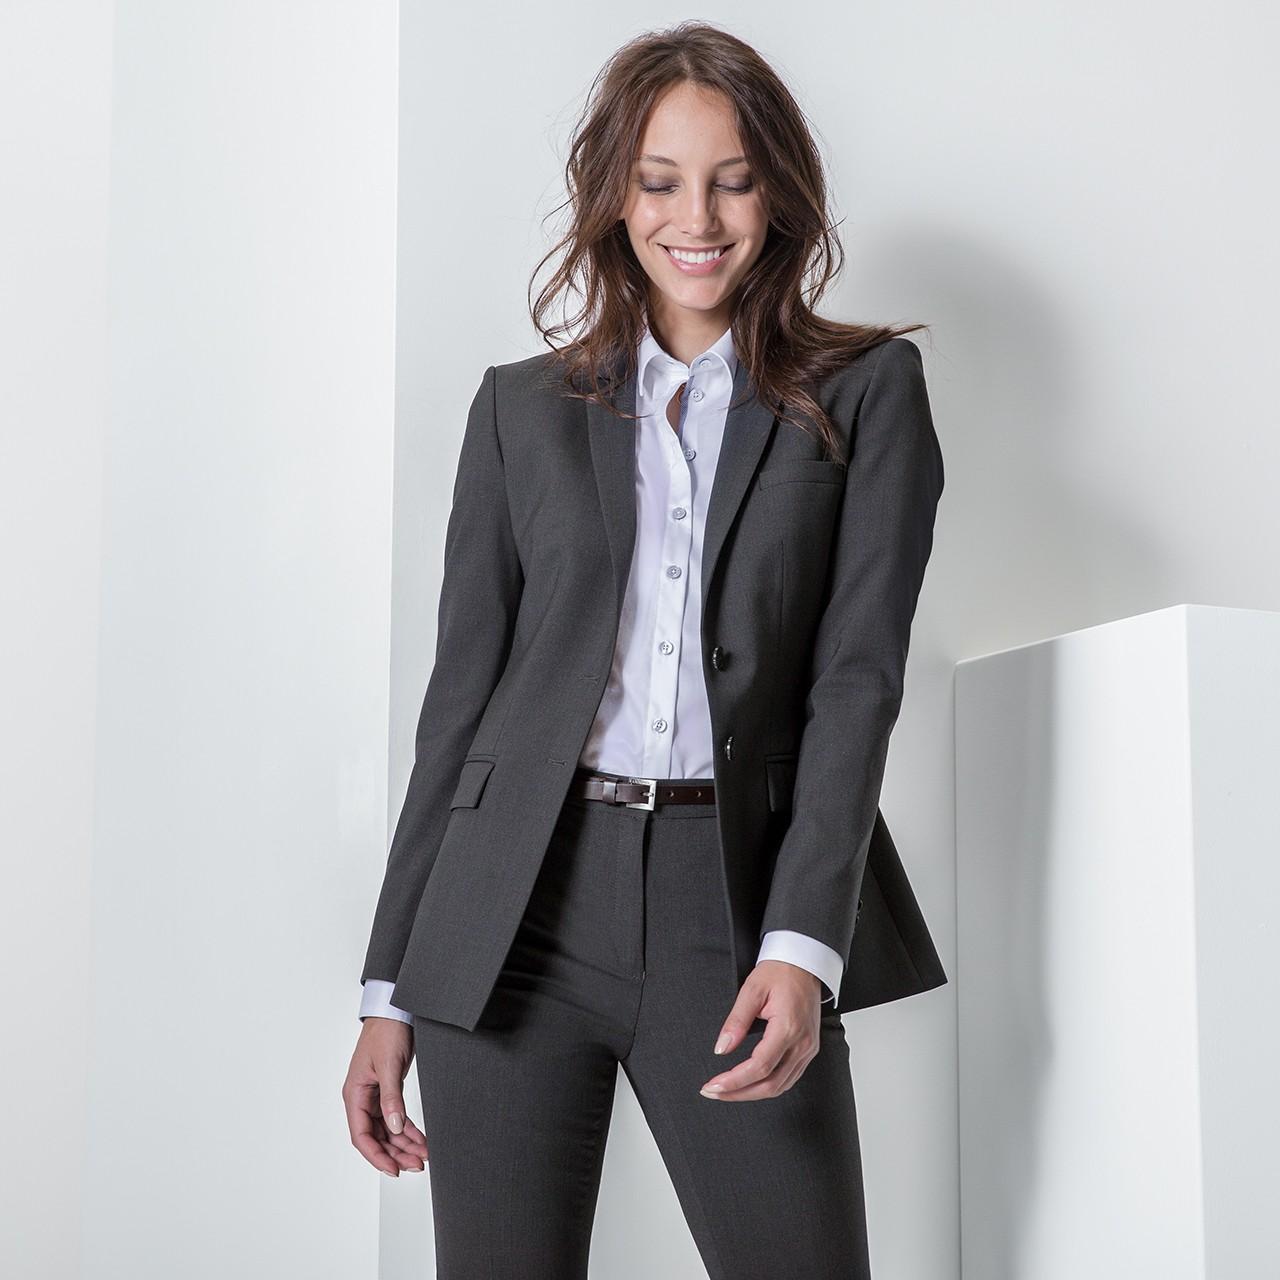 Premium Damen-Langblazer Greiff® | bedrucken, besticken, bedrucken lassen, besticken lassen, mit Logo |